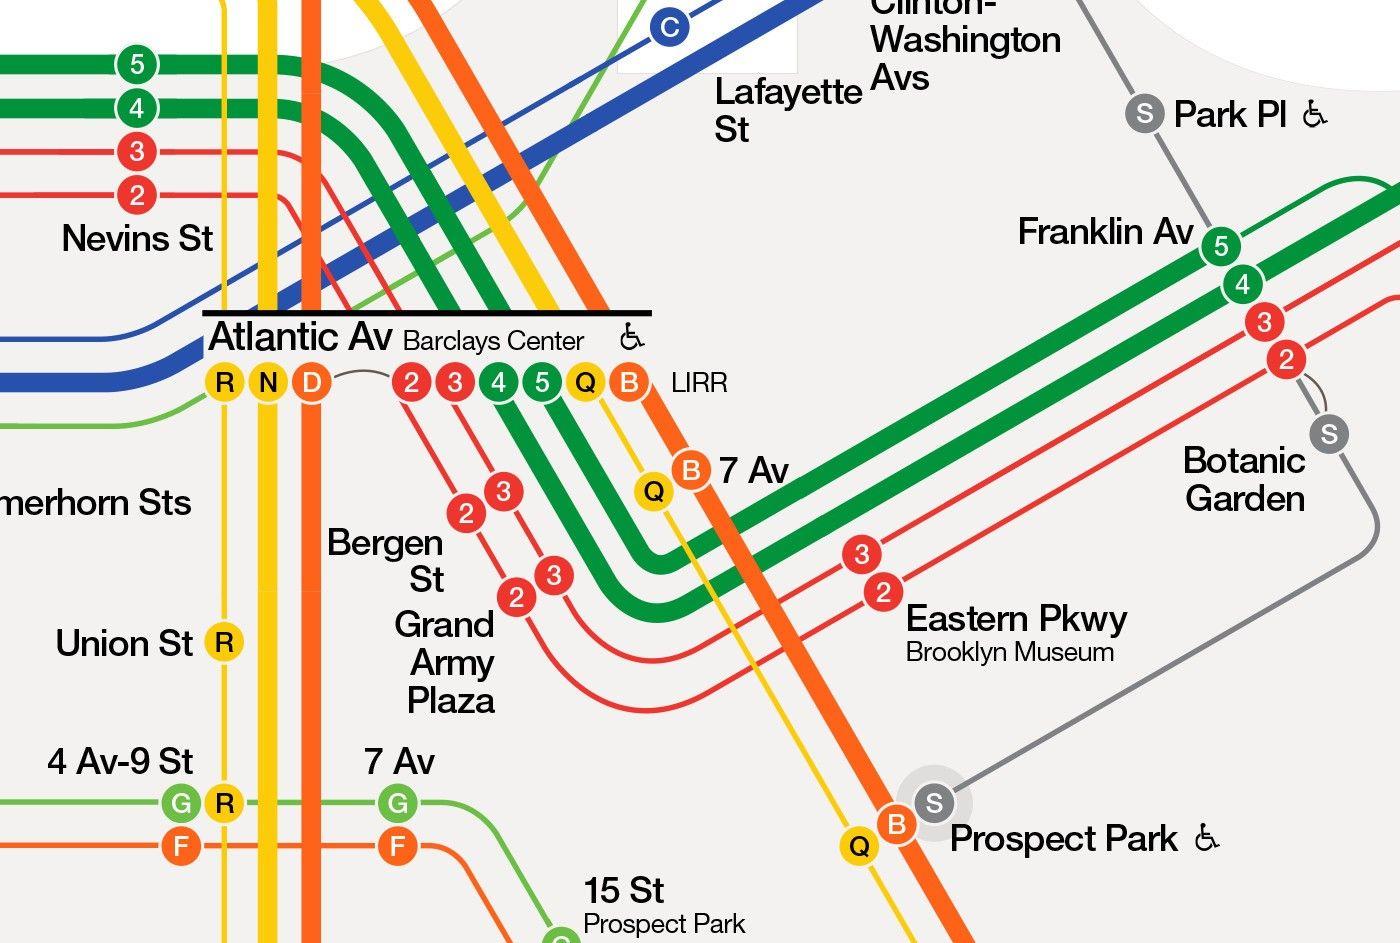 New York Subway Map Redesign.The New York City Subway Map Redesigned Design Nyc Subway Map